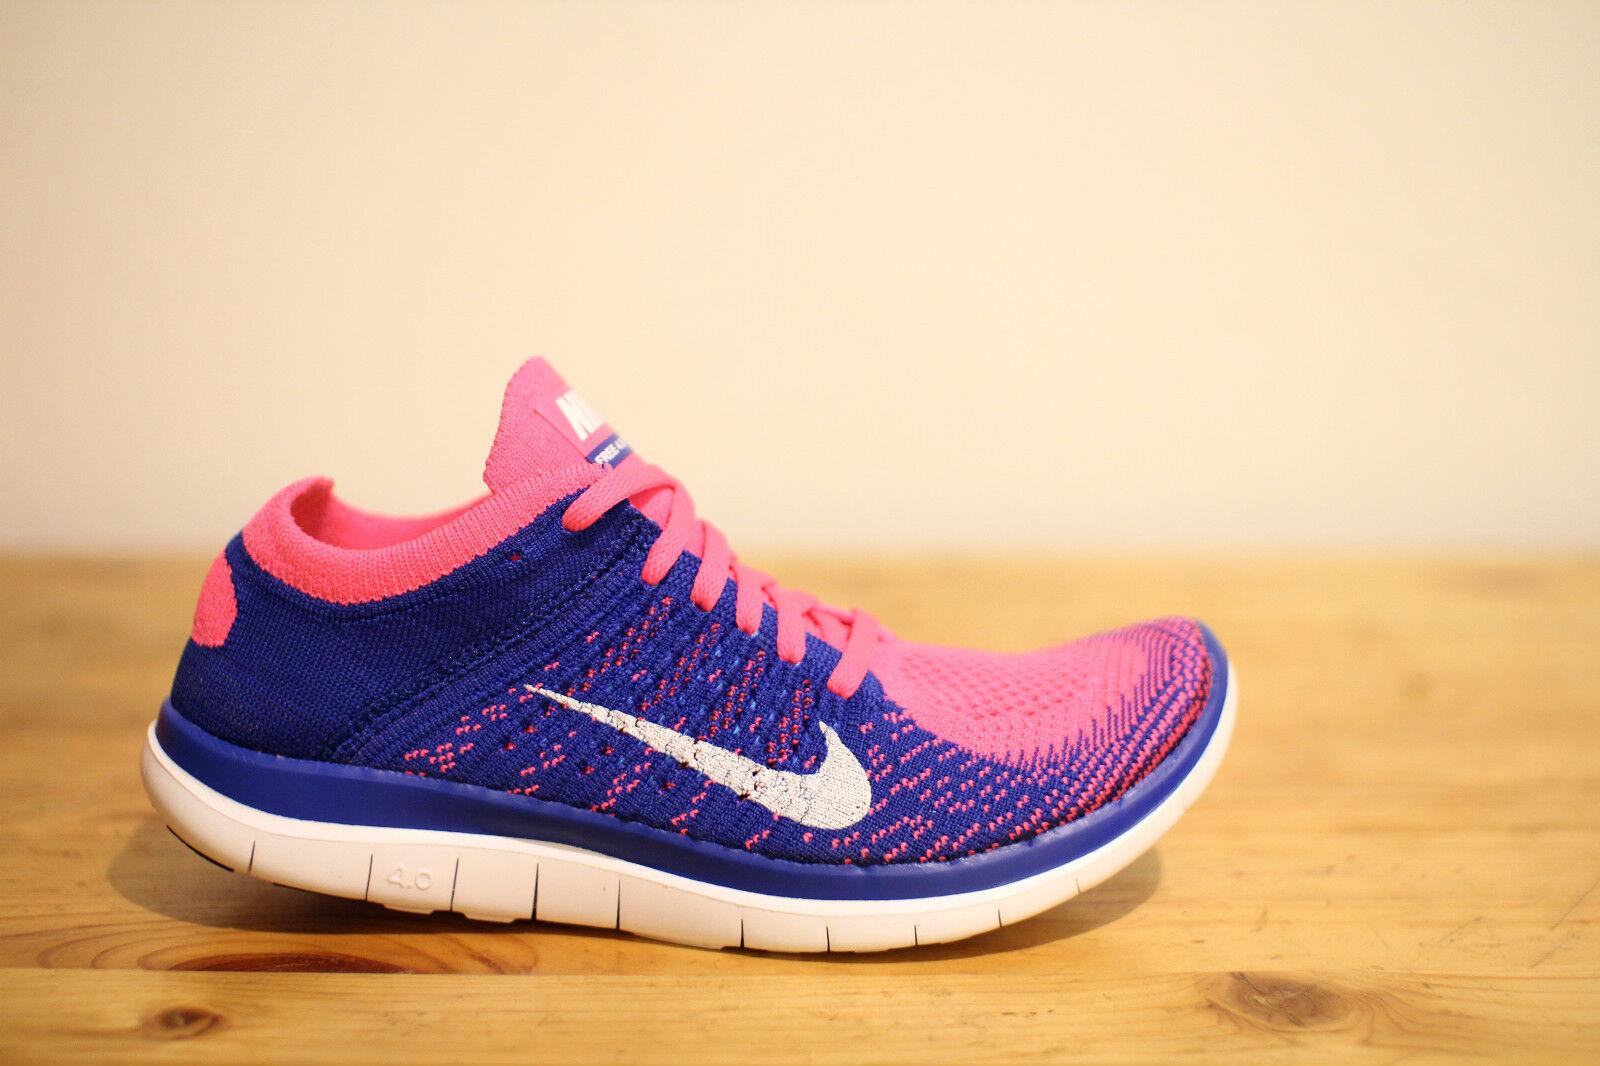 Nike Free 4.0 Flyknit Blau Pink Gr. 37,5 UK 4 NEU & OVP